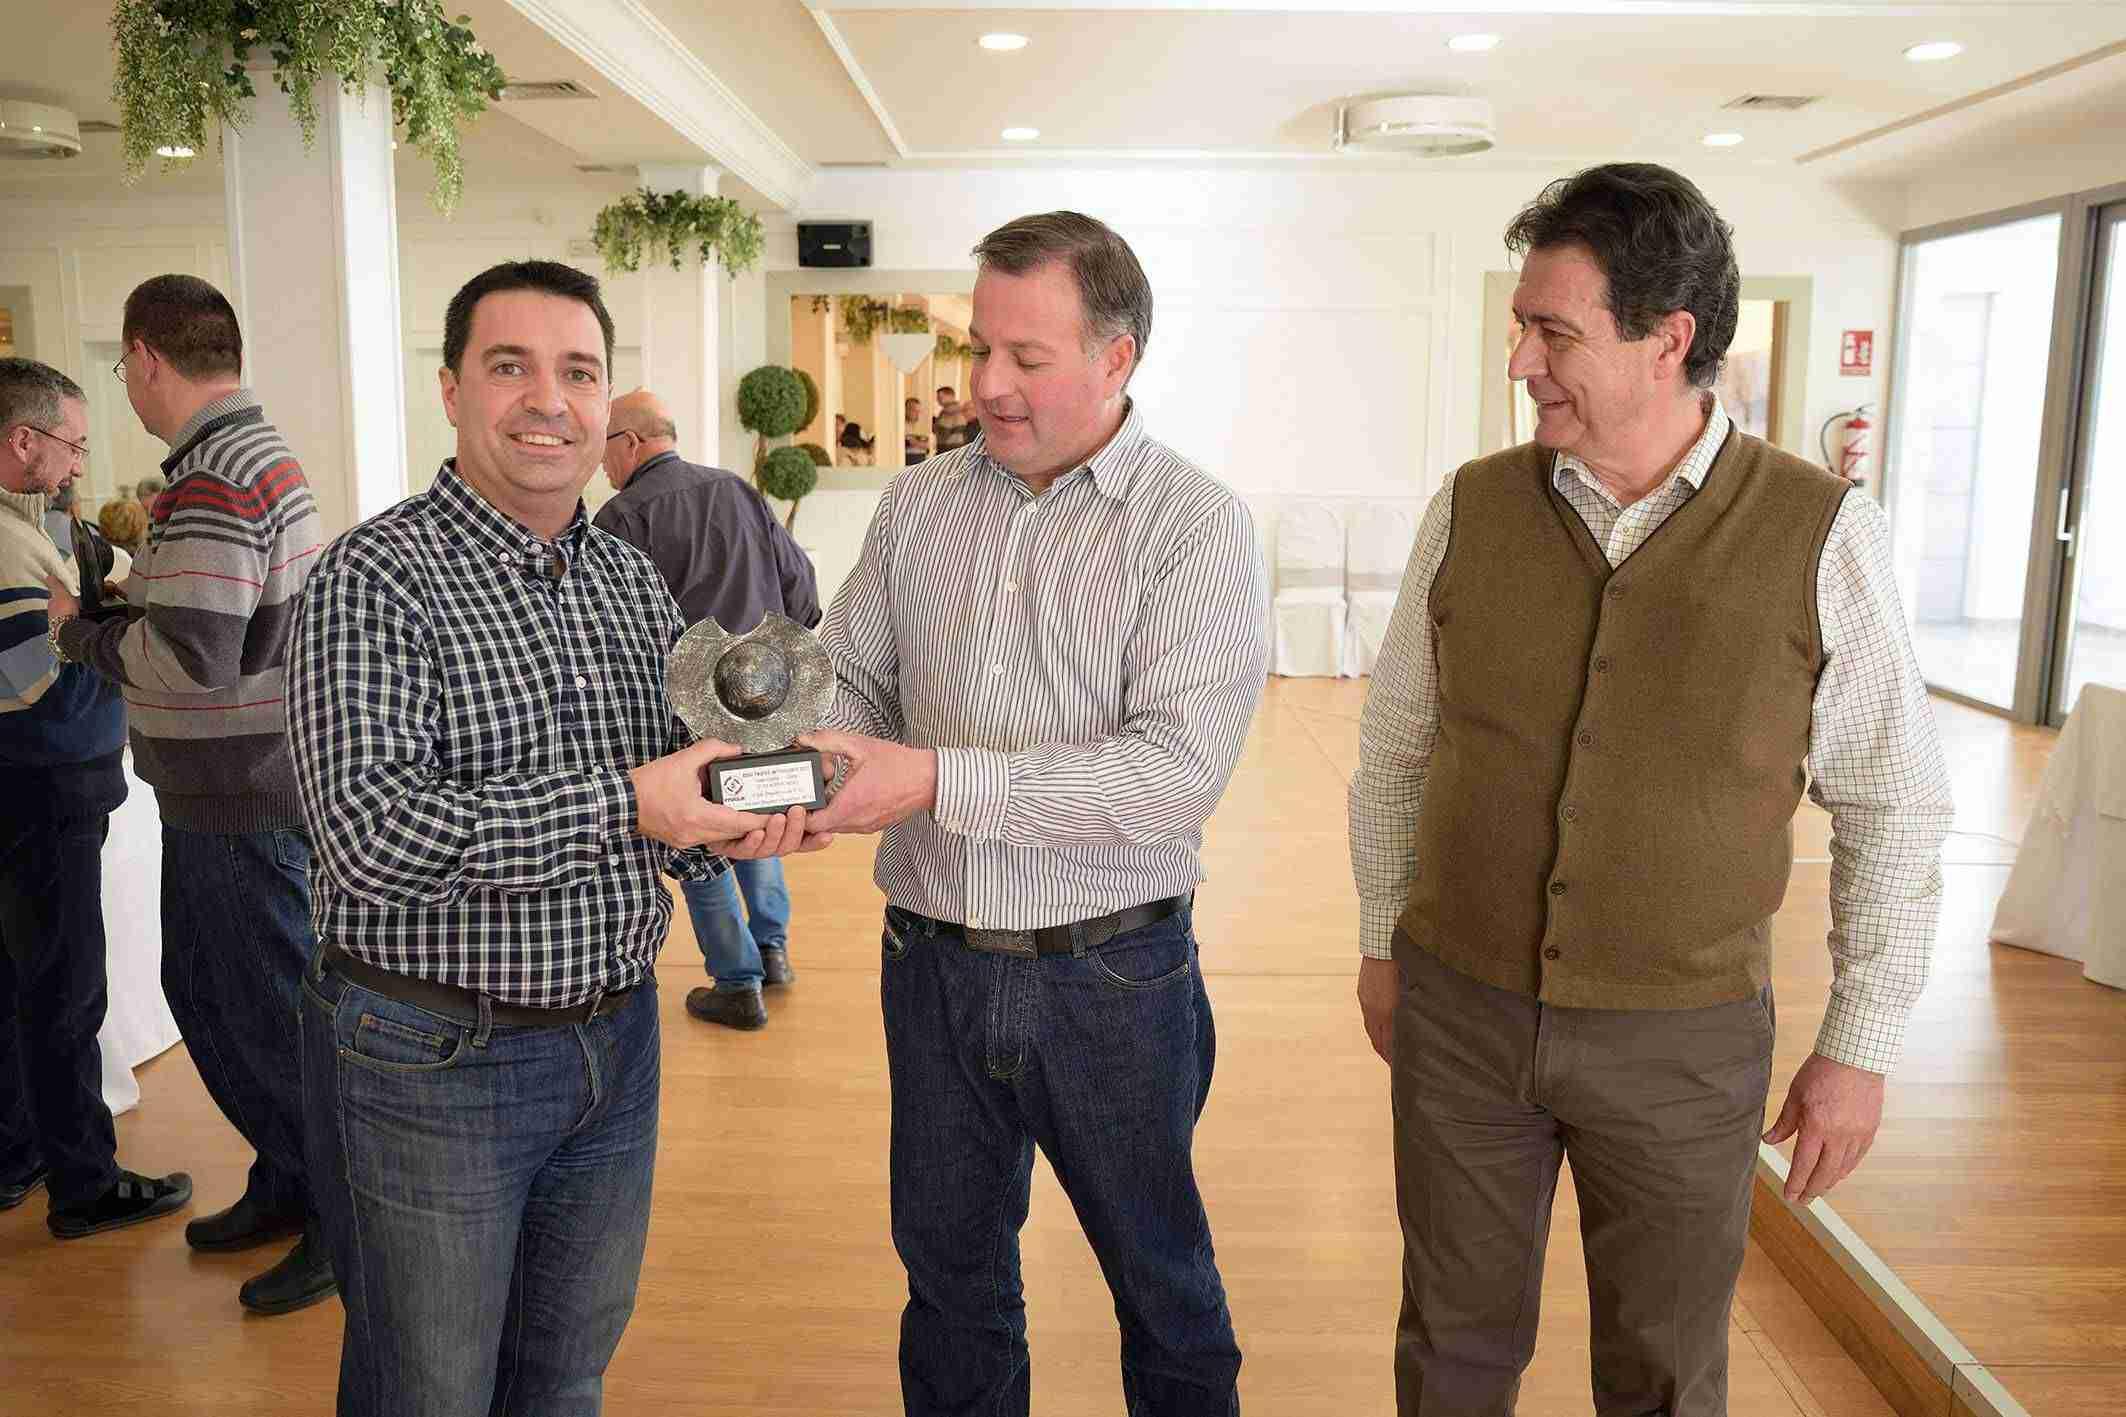 Argamasilla de Alba acogió la entrega de trofeos del XXXII Torneo Regional Interclubes 2017 de tiro olímpico 5